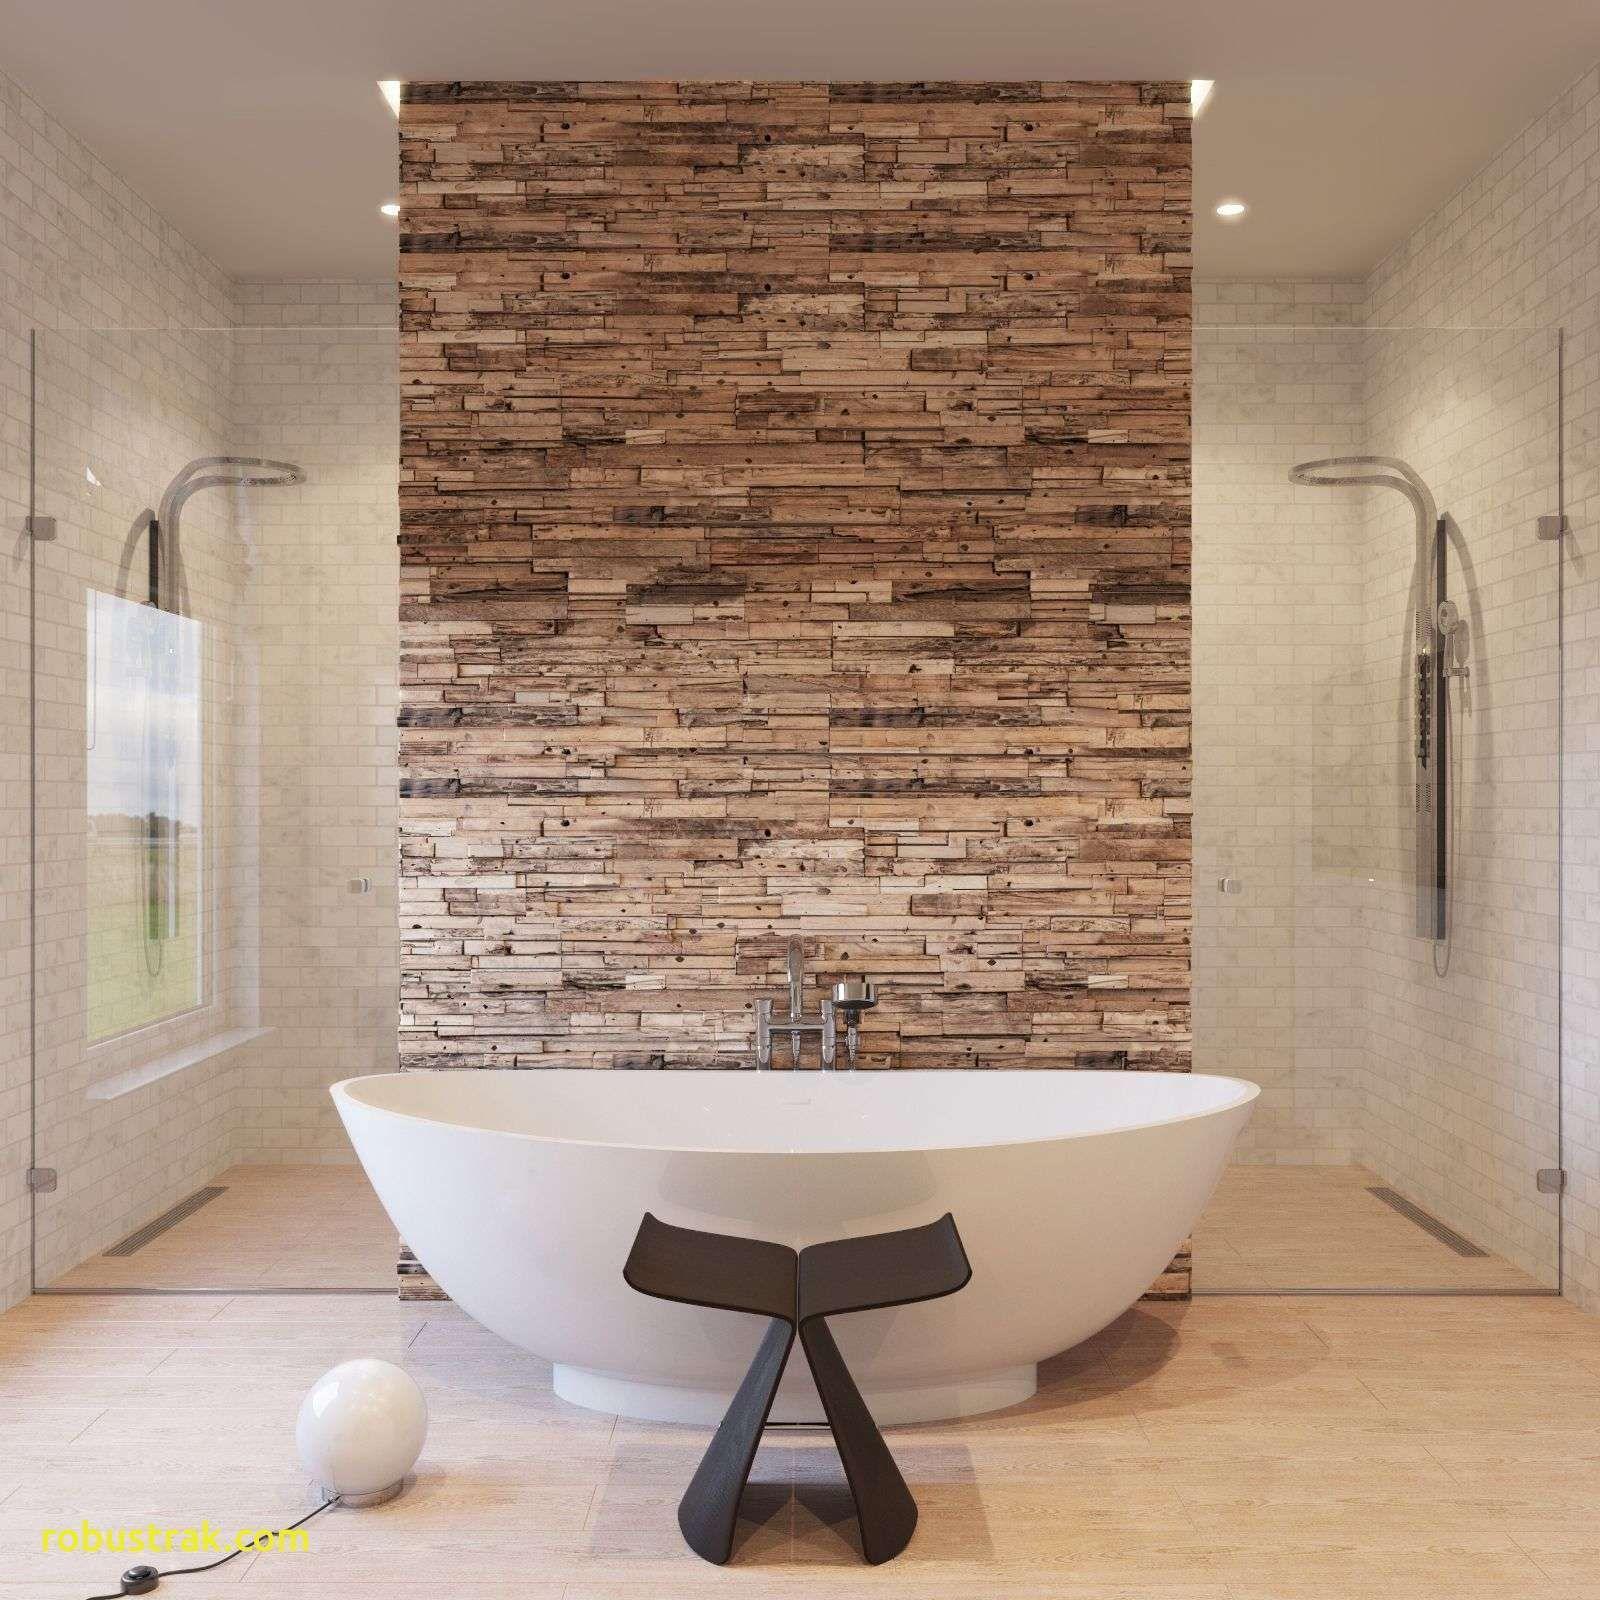 Incredible Decorative Glass Wall Panels | Wood wall ...